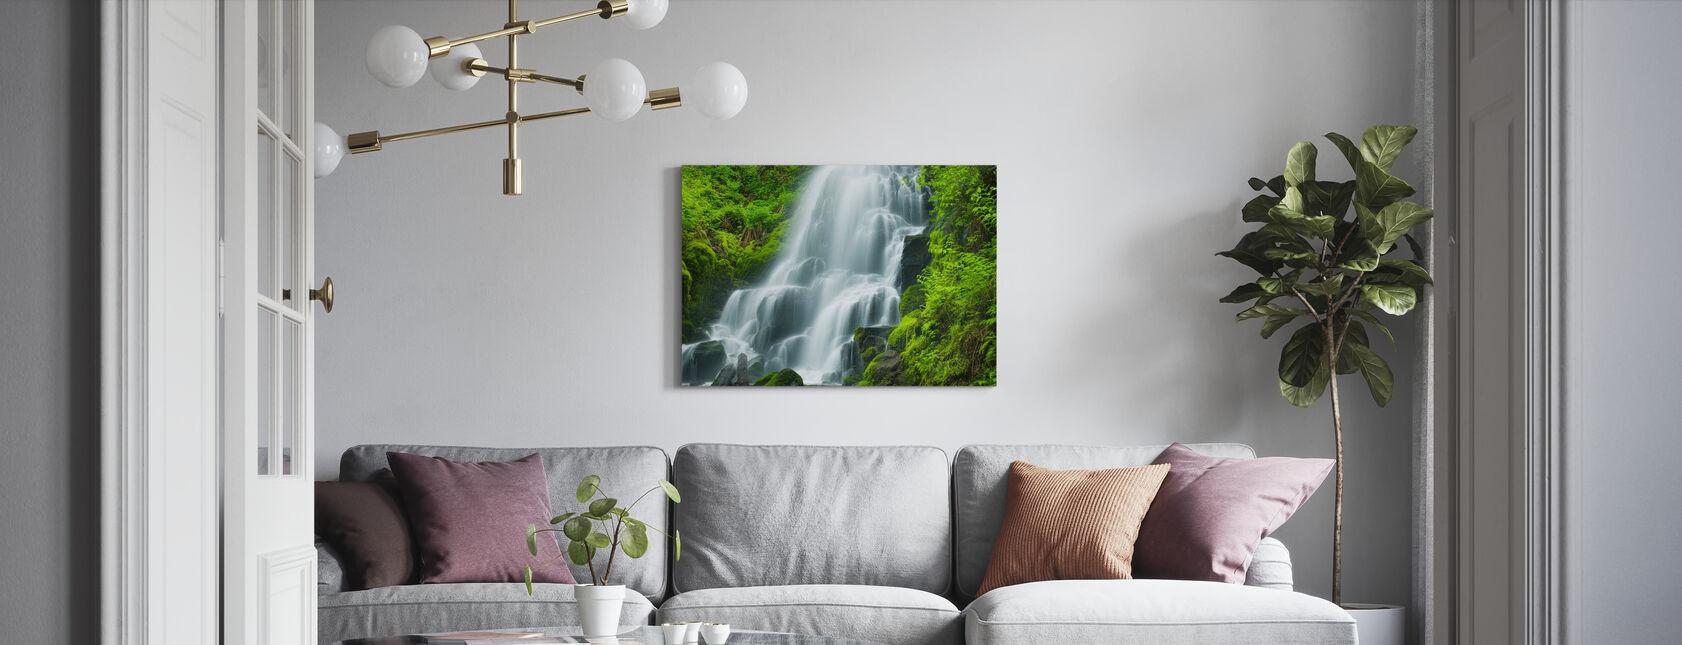 Fairy Falls - Canvastavla - Vardagsrum